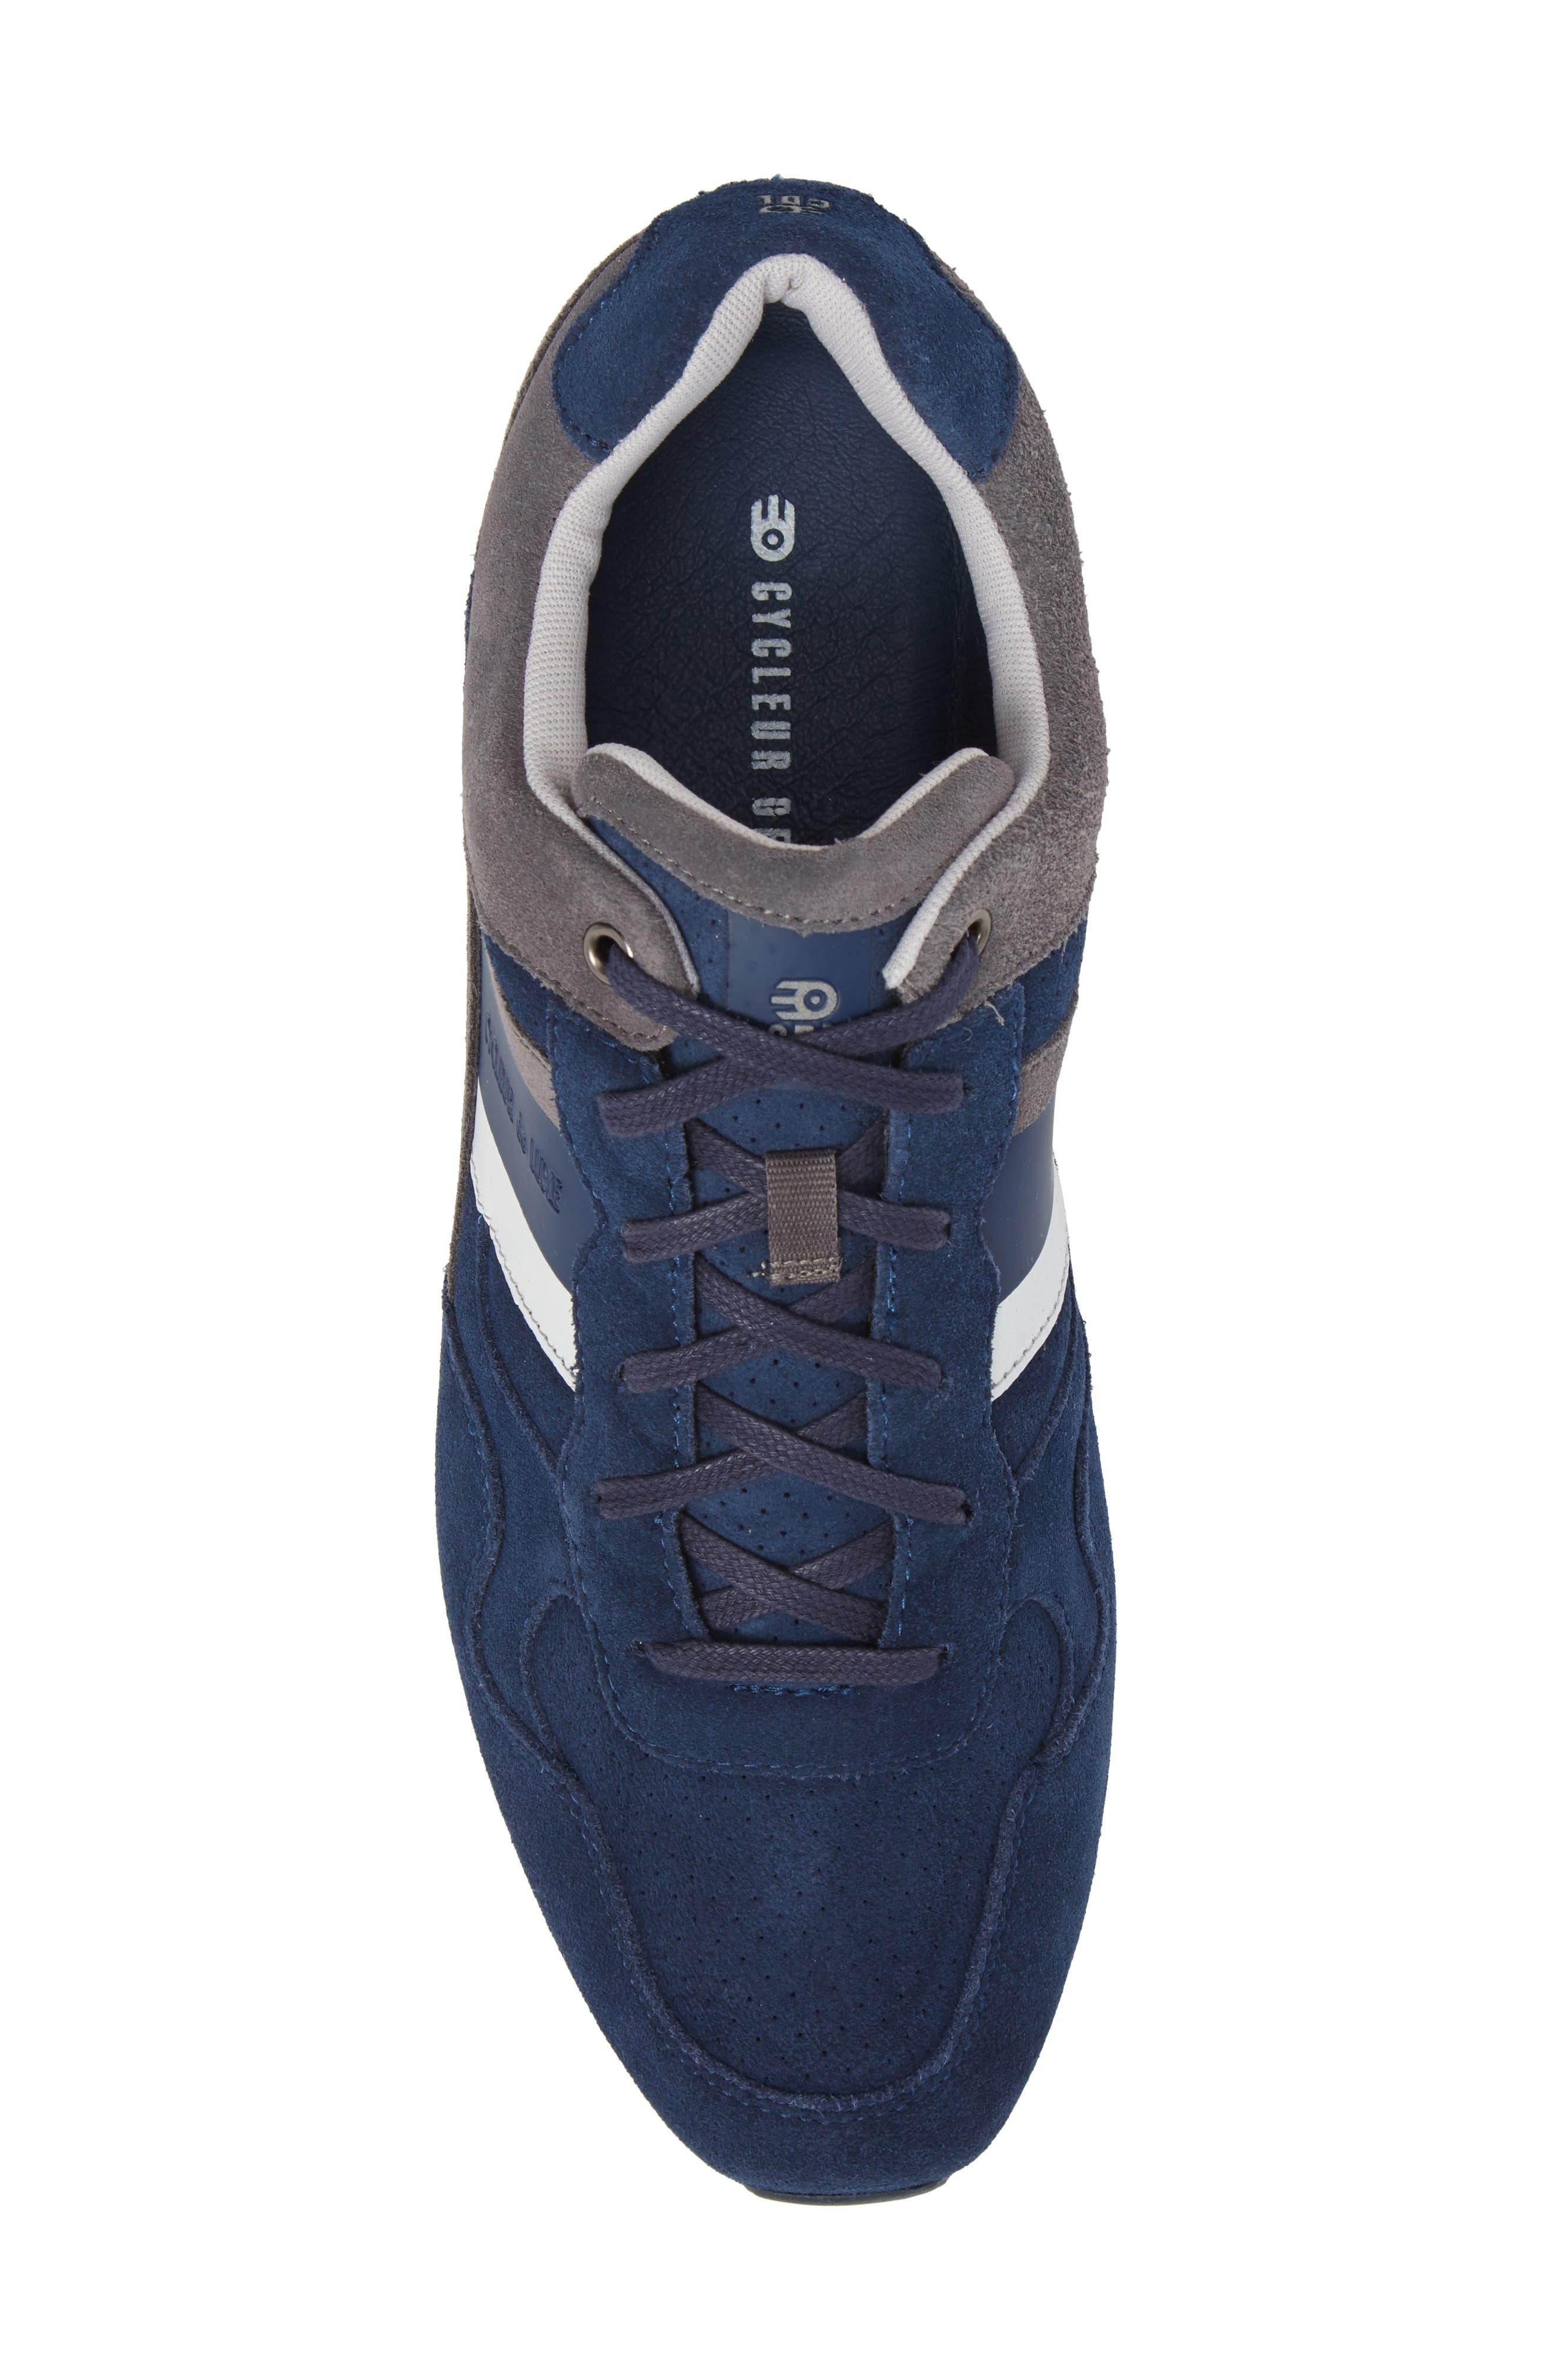 Scarpo Low Top Sneaker,                             Alternate thumbnail 5, color,                             NAVY SUEDE